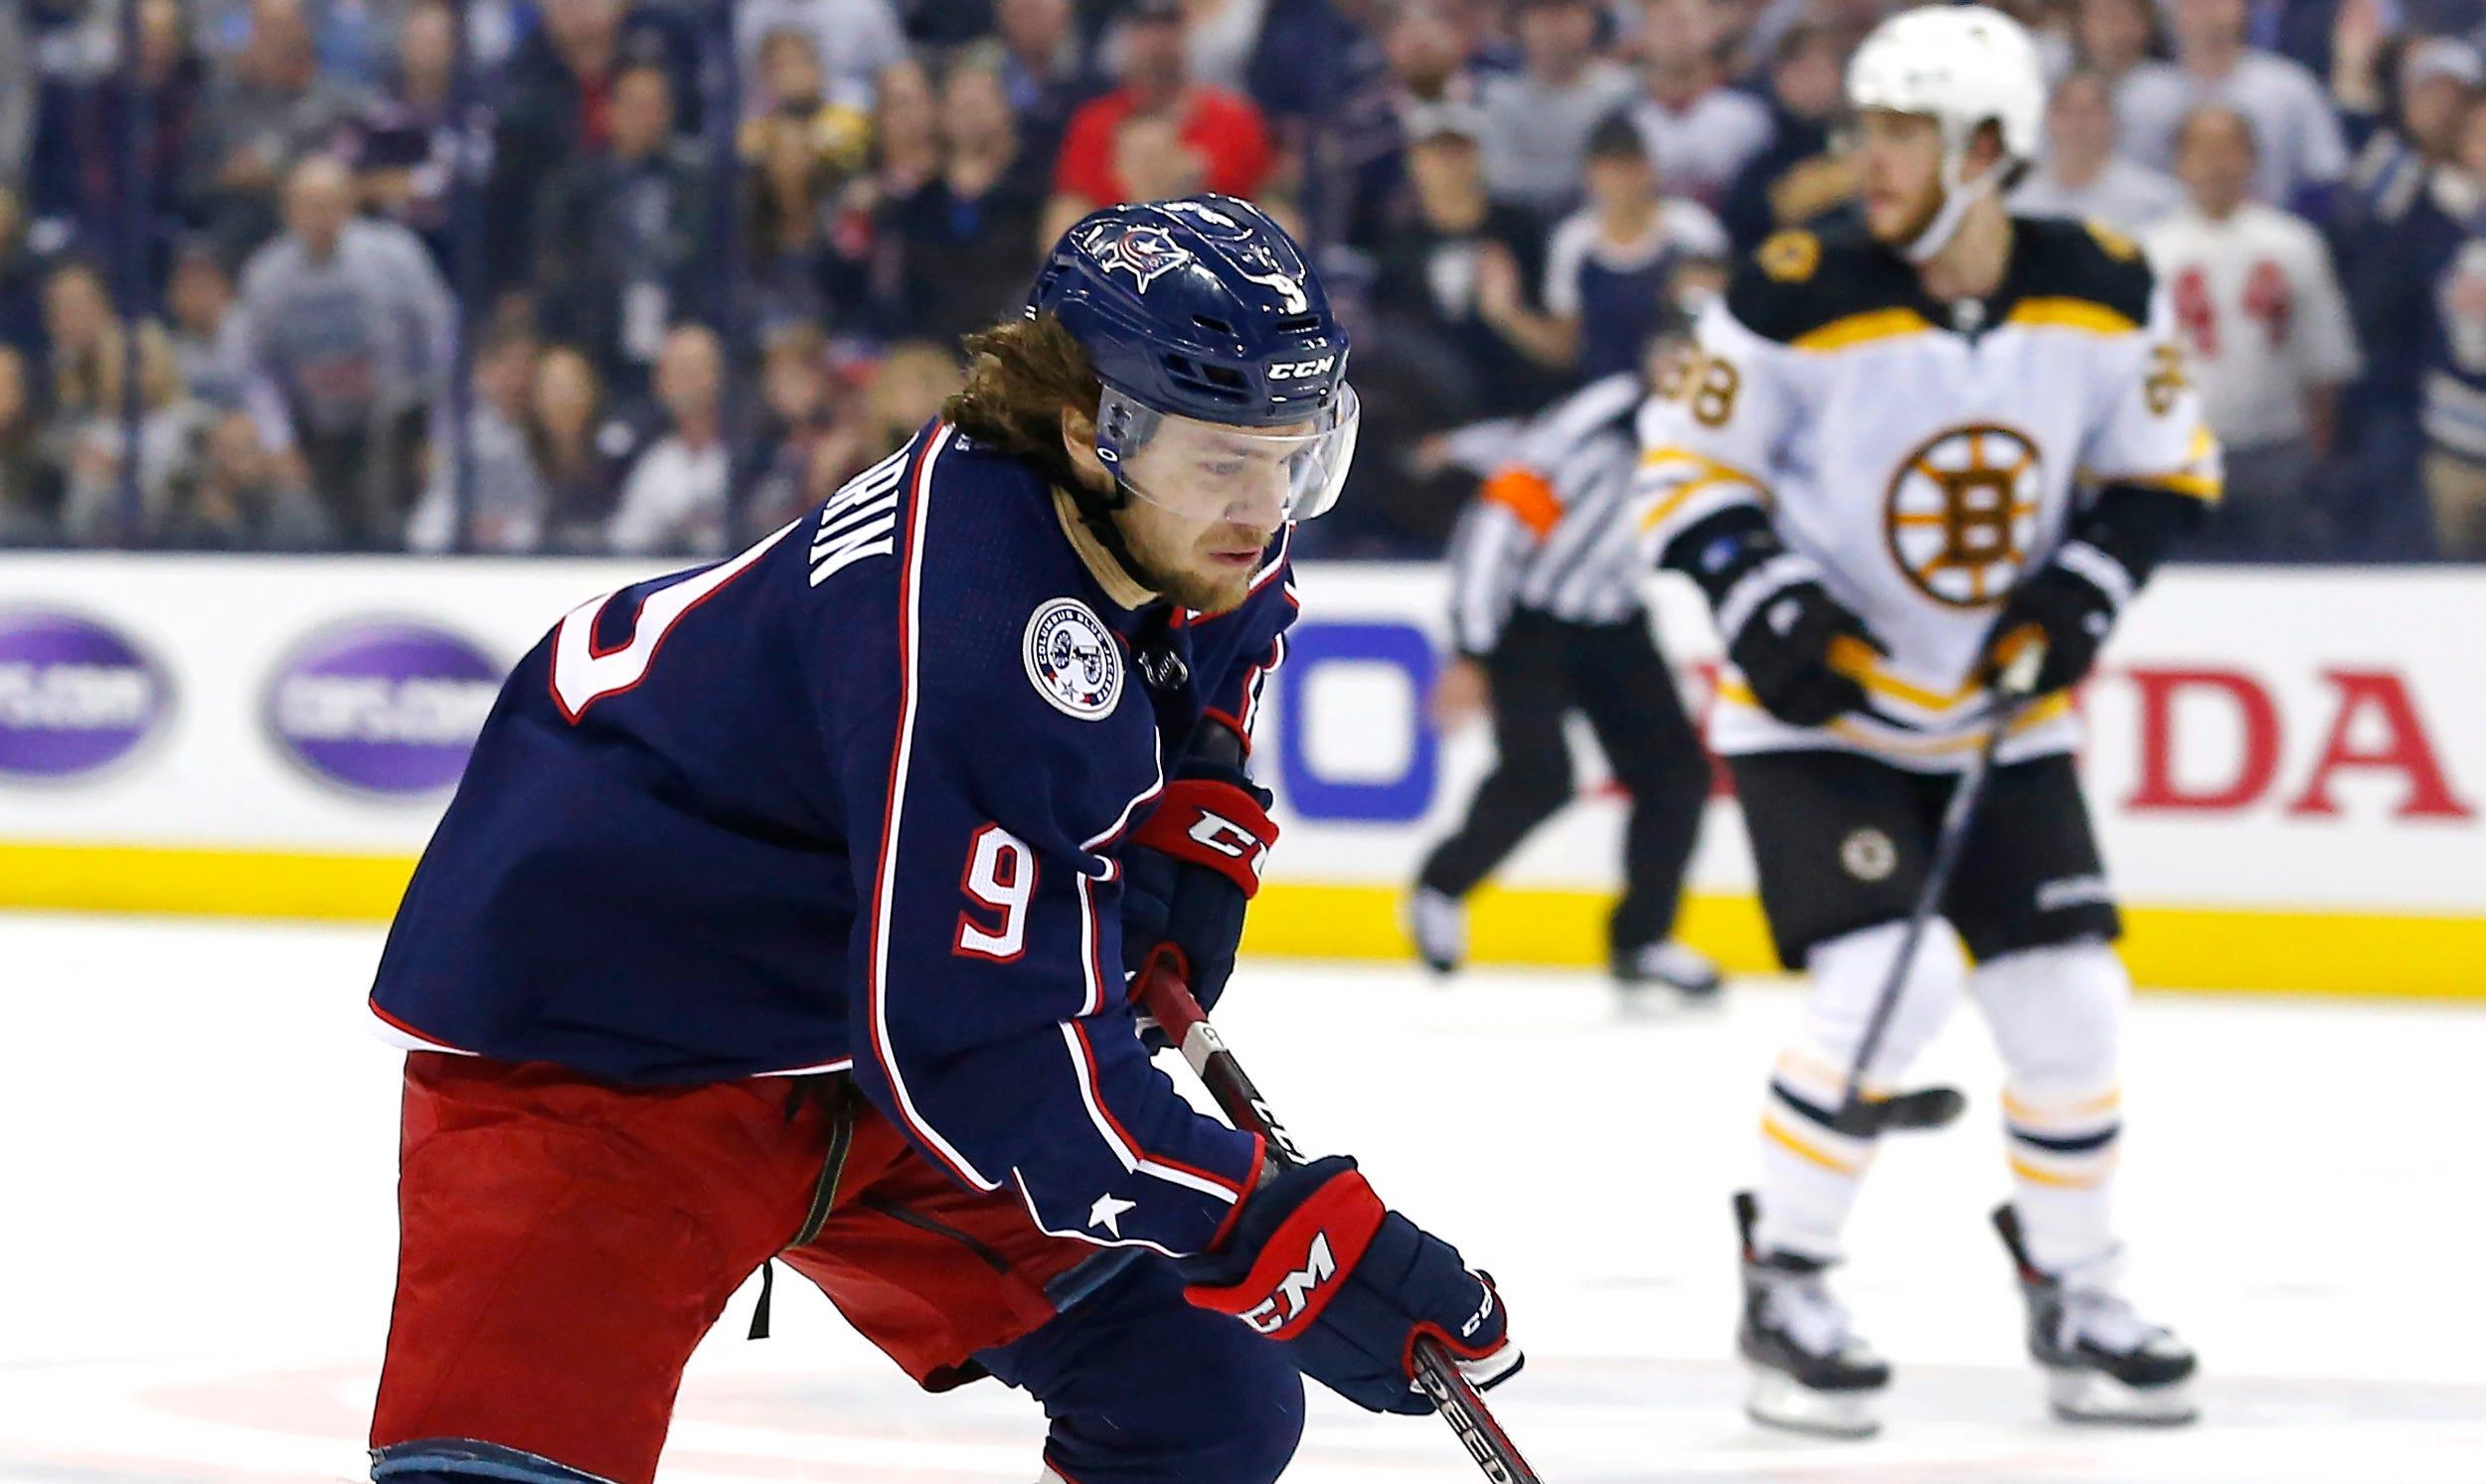 Carolina's Justin Williams to take a break from the NHL to start season